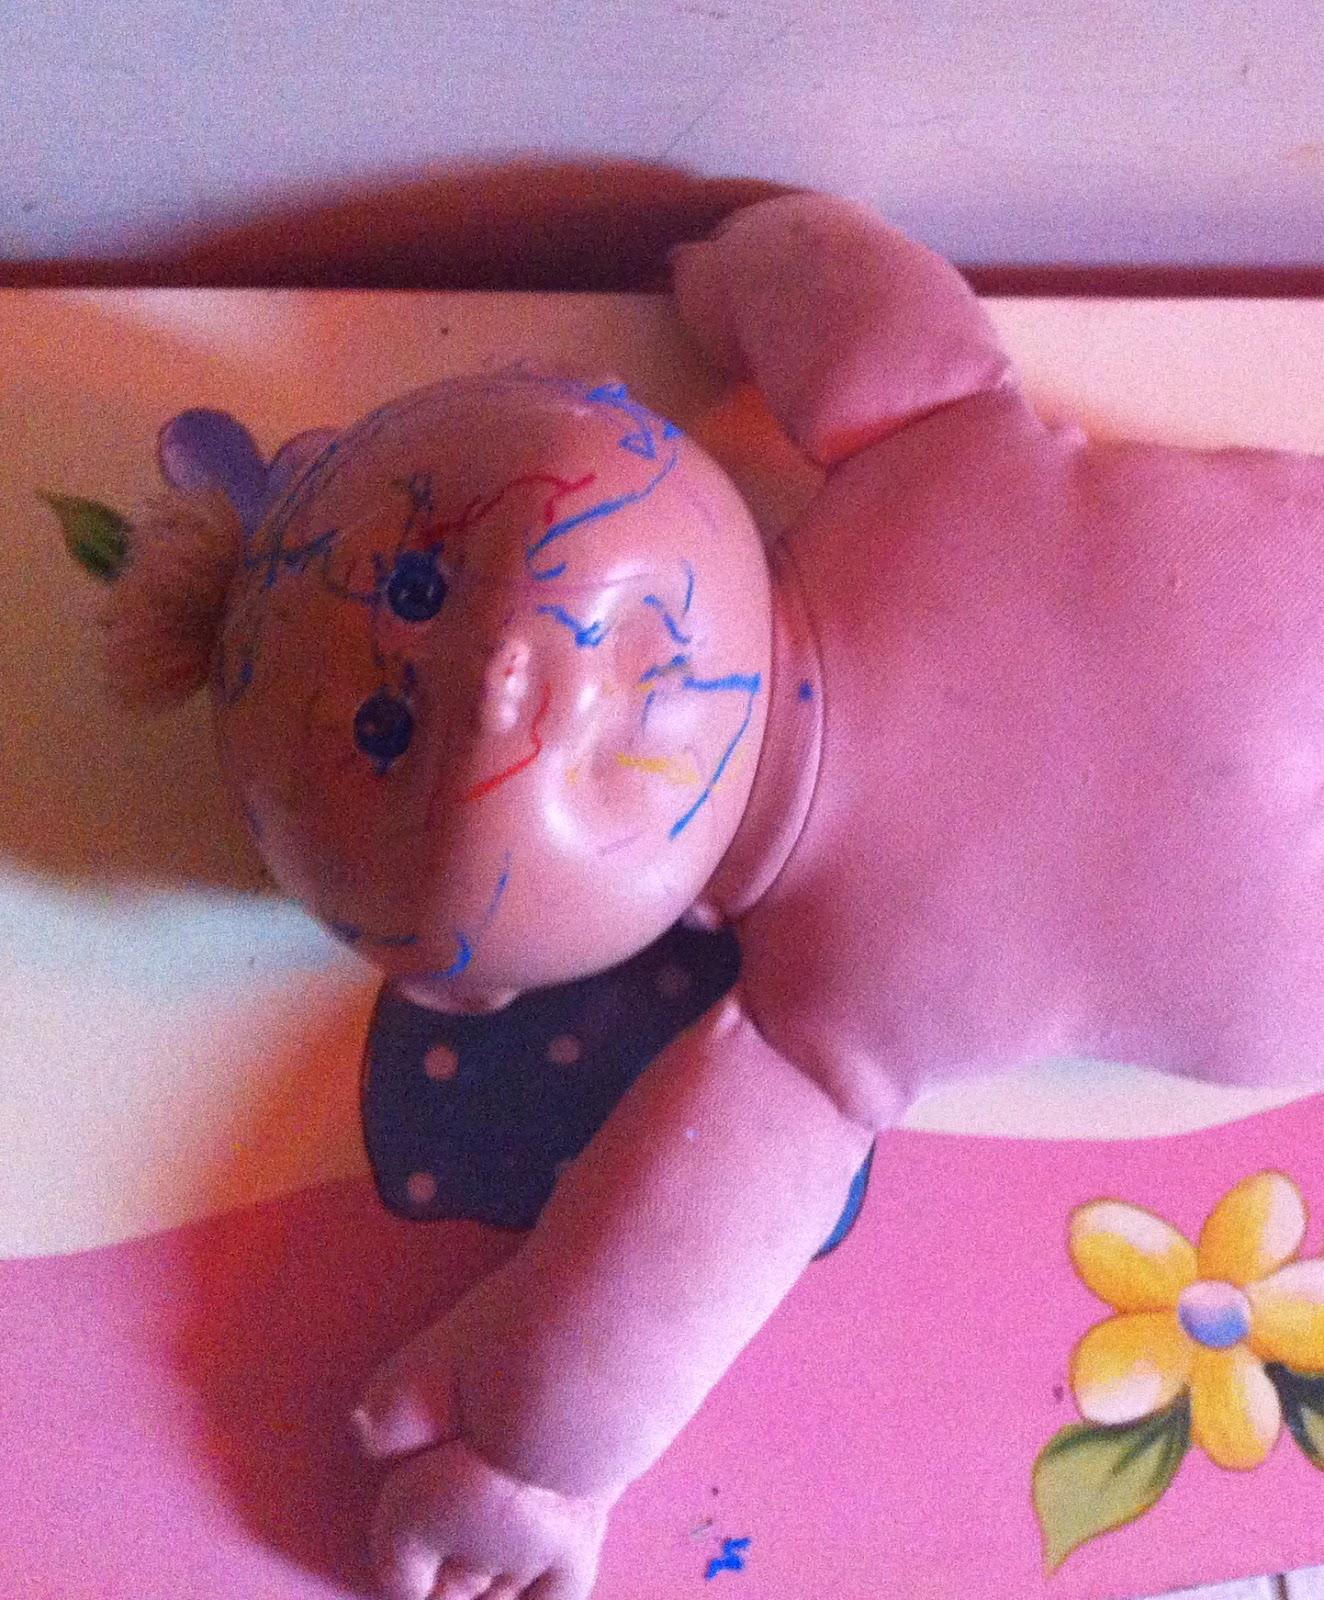 Jenny Luets, Toddler Art, 2014